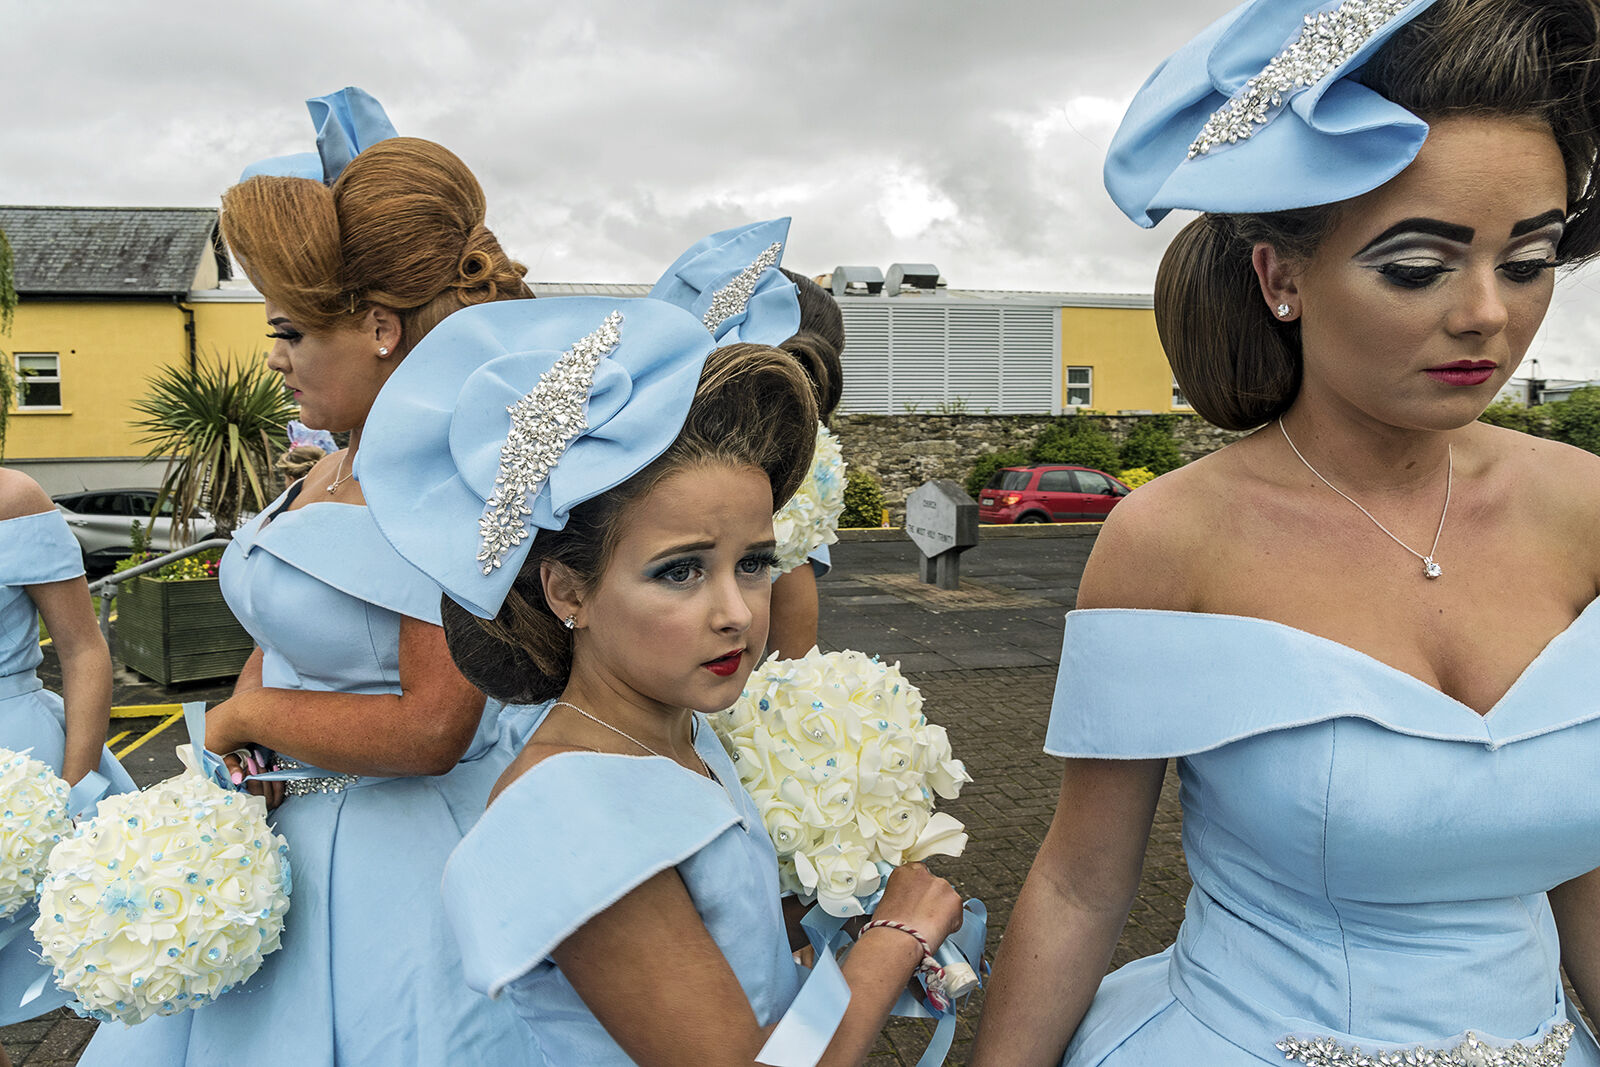 The Bridesmaids, Wexford, Ireland 2019